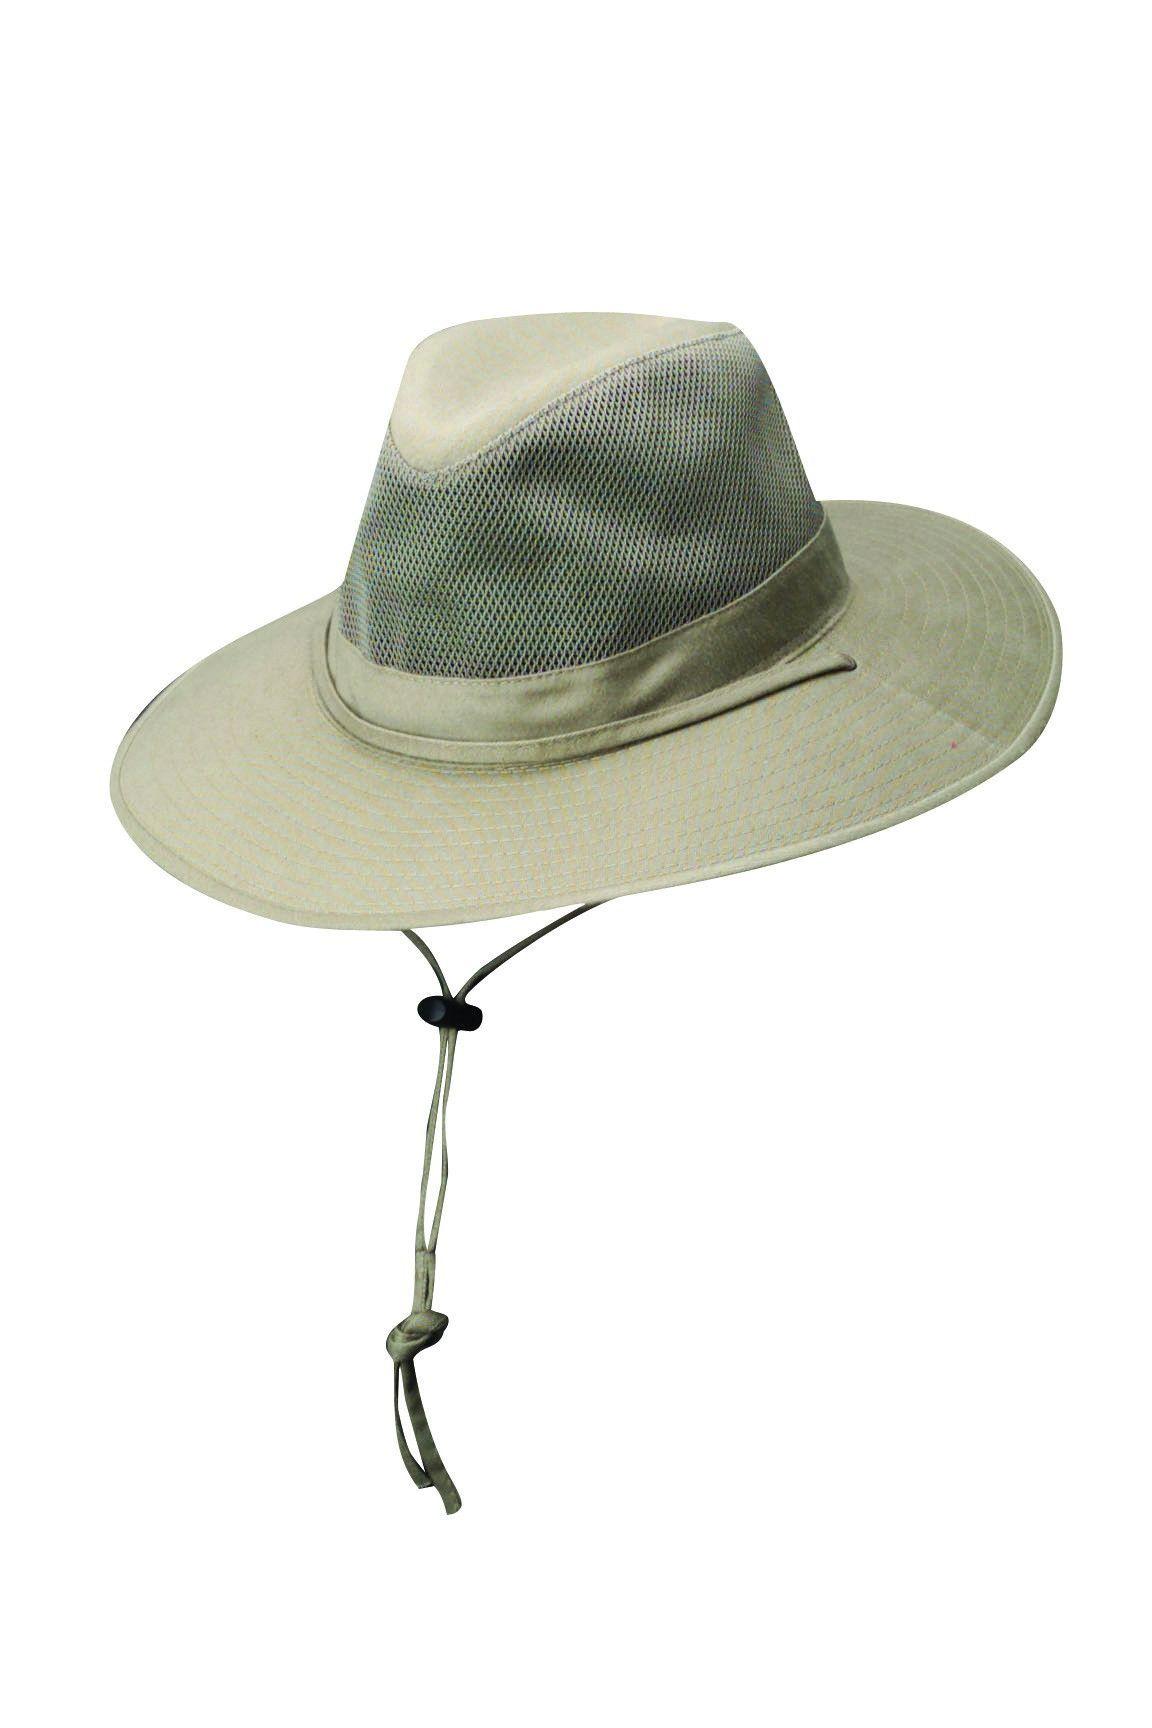 ceed892796ca45 Solarweave SPF 50+ Safari Hat by Dorfman Pacific   Hats   Safari hat ...